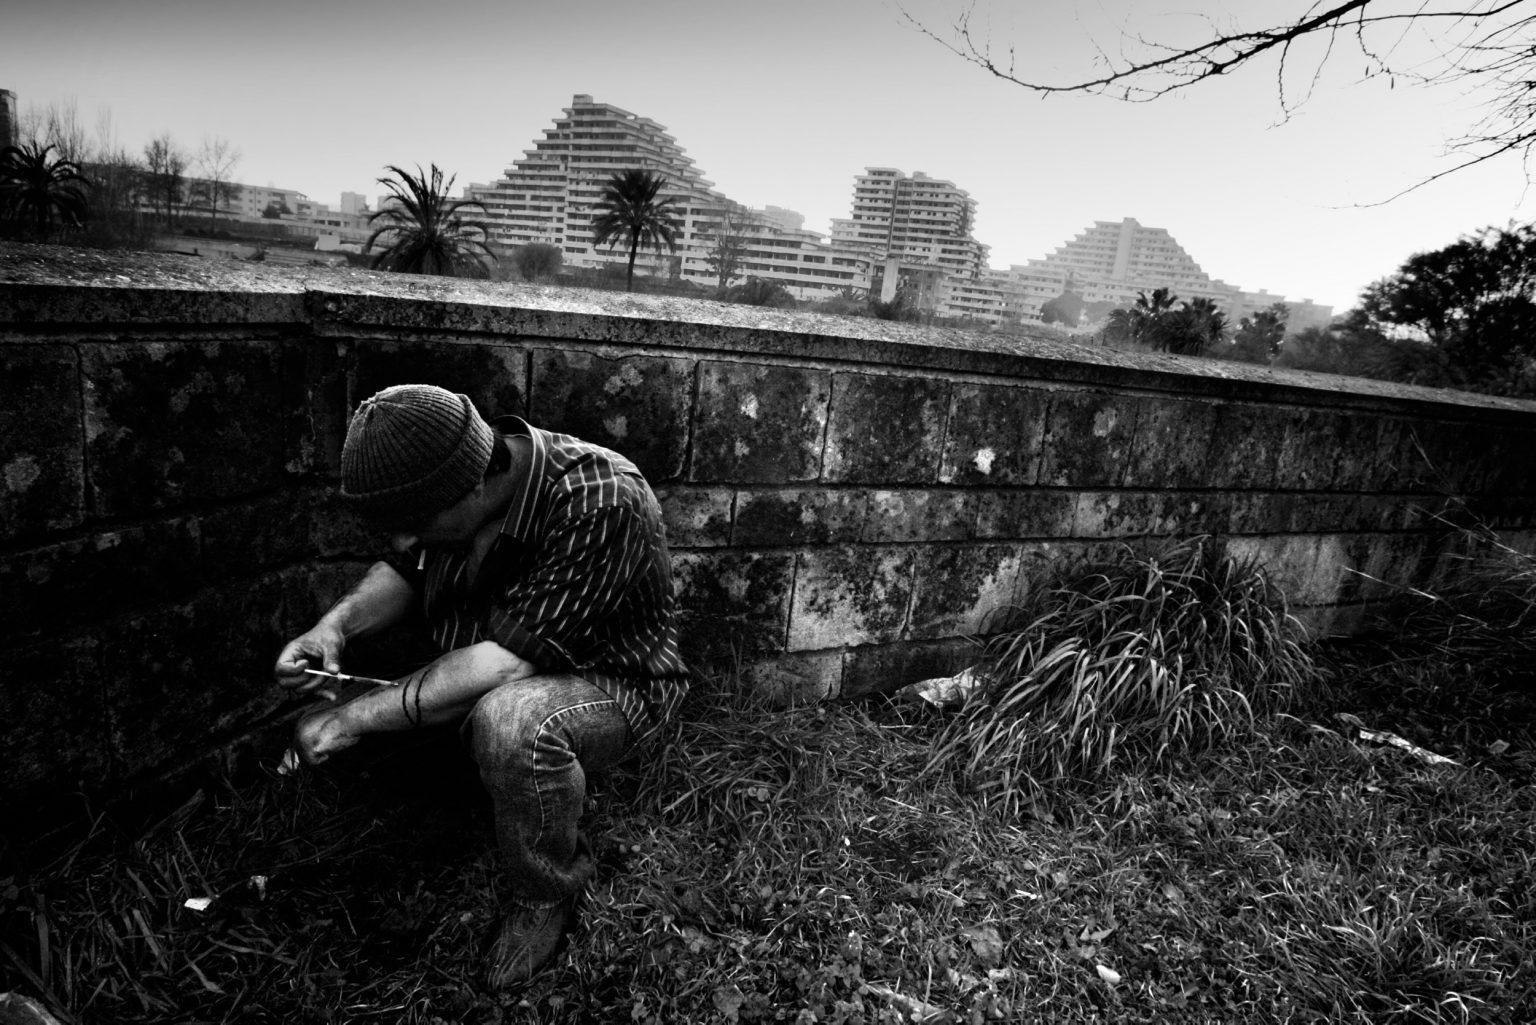 Drug addict shooting drugs next to the Sails. Scampia neighborhood. Naples, Italy, 2008